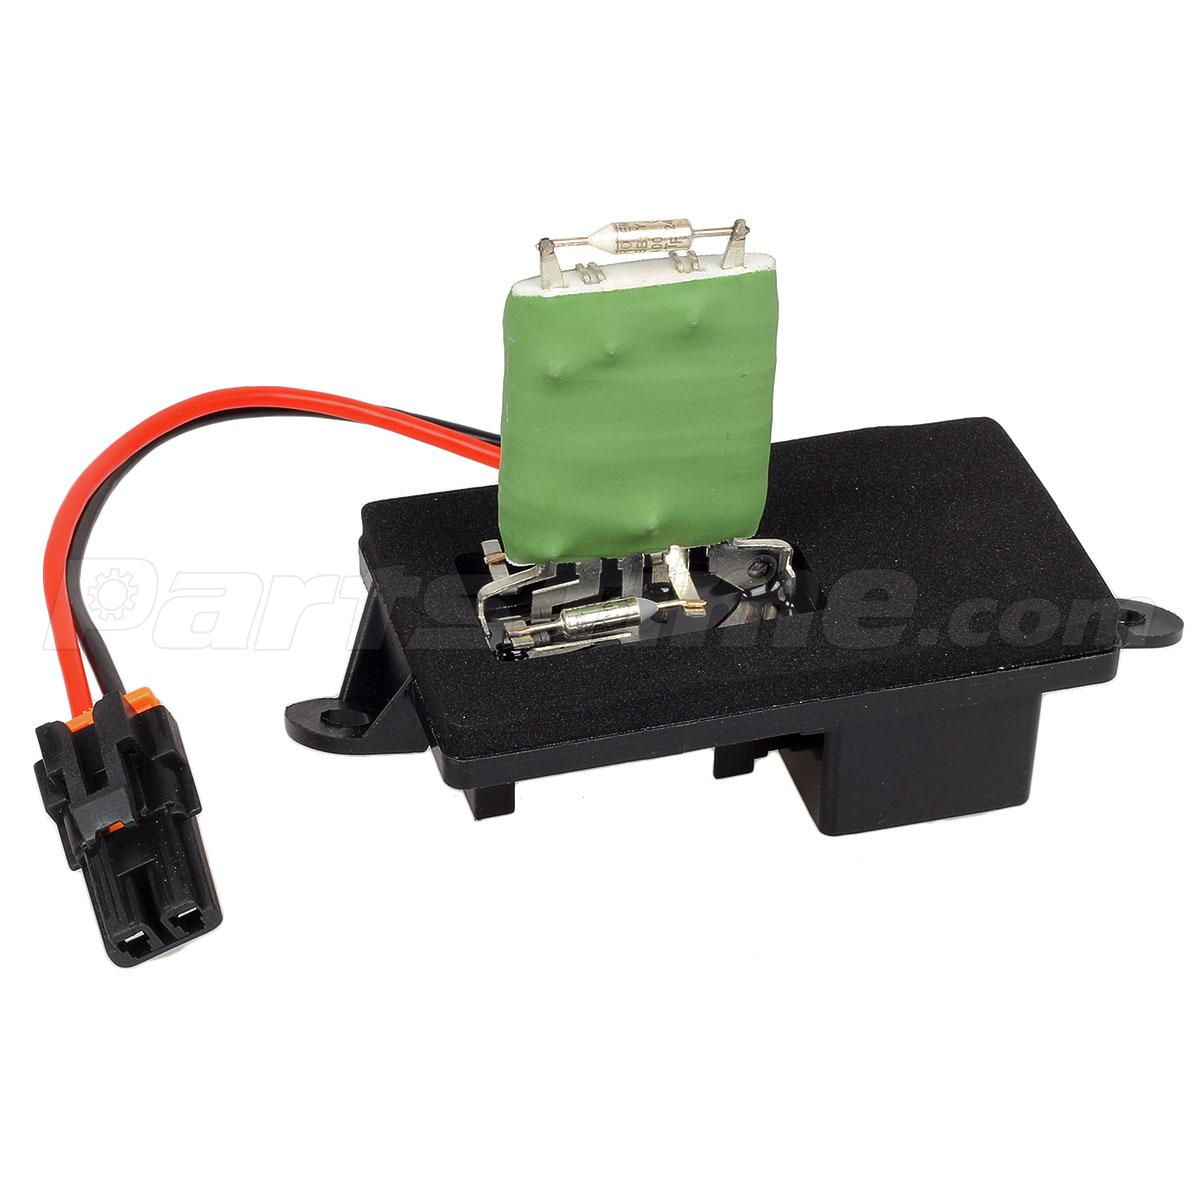 Heater Blower Motor Resistor For Gmc Chevrolet Silverado Yukon Tahoe 15305077